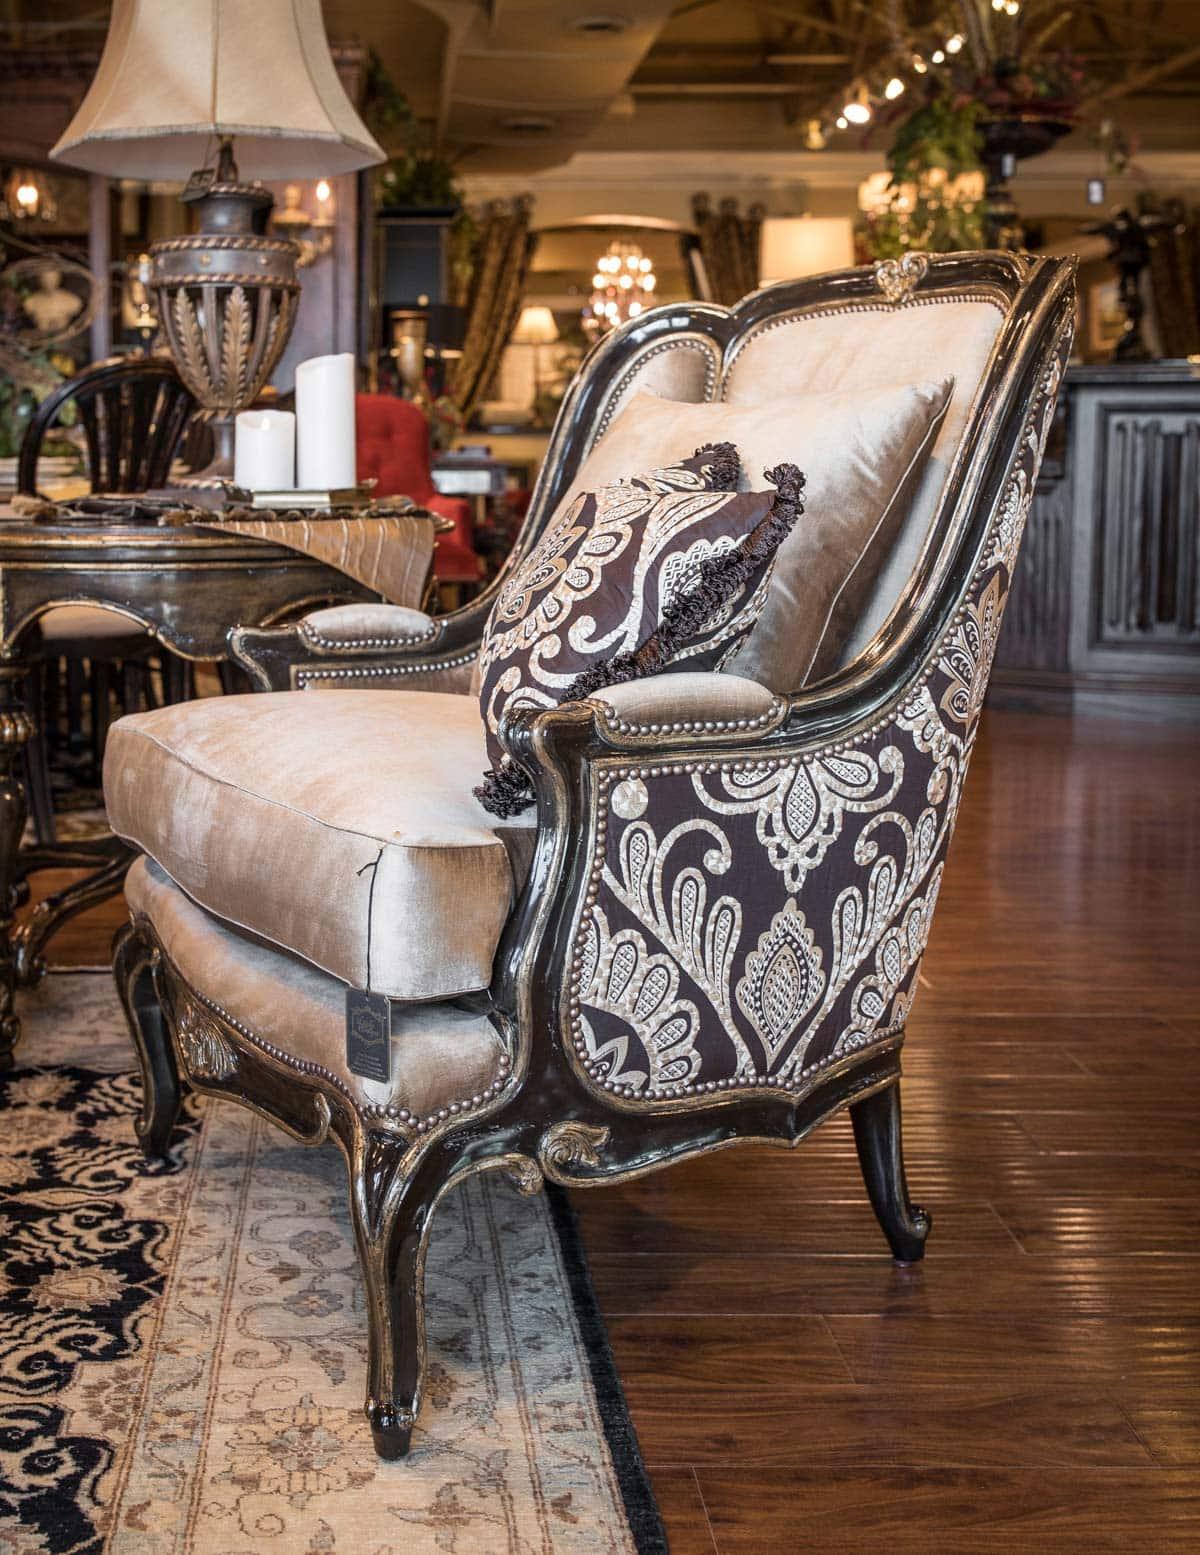 Attirant Carsons Furniture Wilmette Home Design Ideas And Pictures